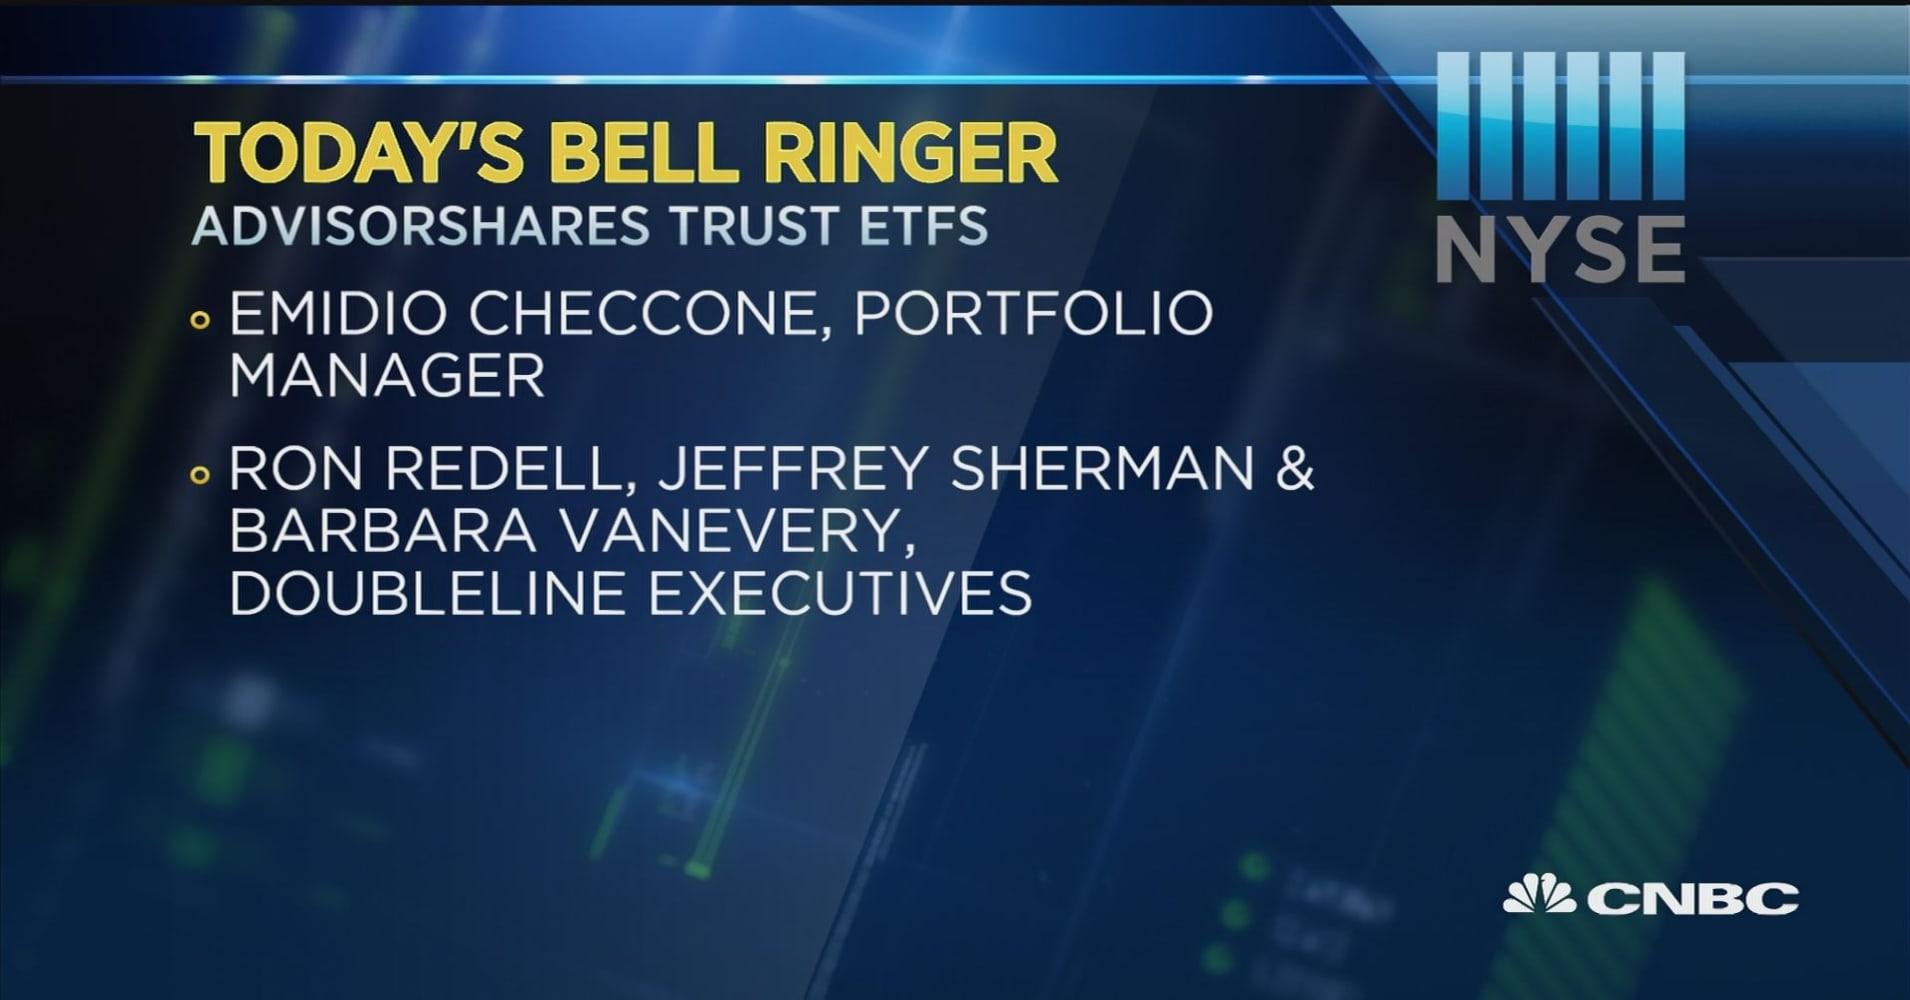 Today's Bell Ringer, January 7, 2019